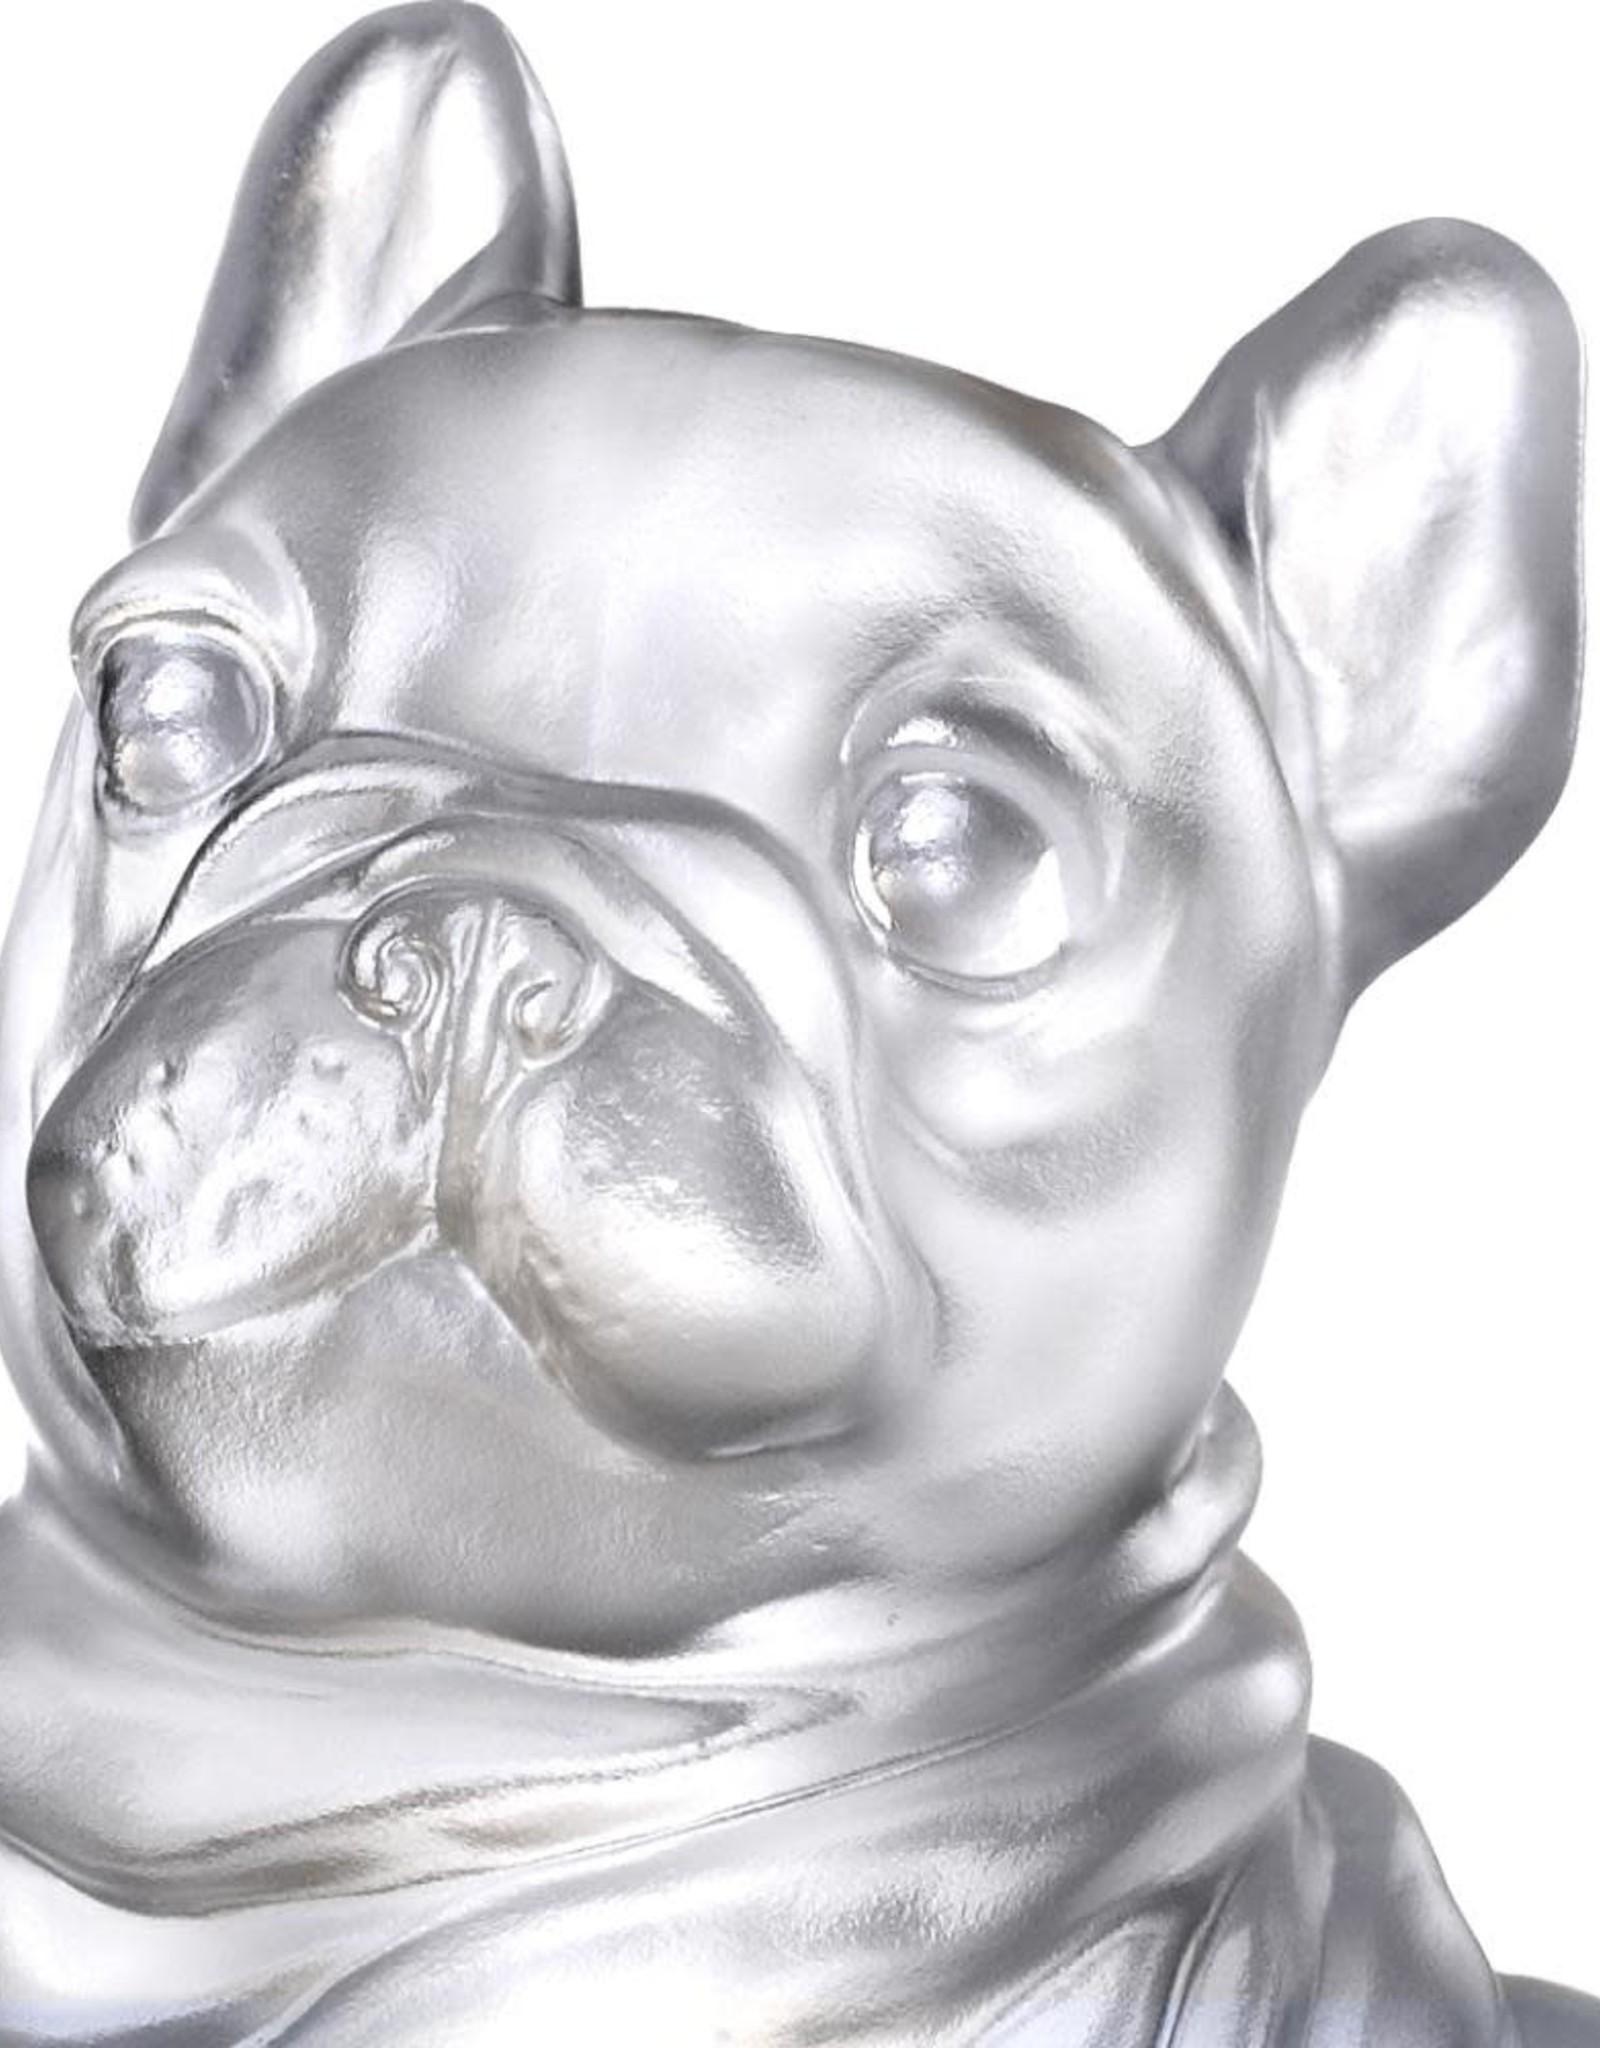 LIULI Crystal Art Crystal French Bulldog Heads Up! (Exclusive U.S. Edition with Gilded Peony Display Base)